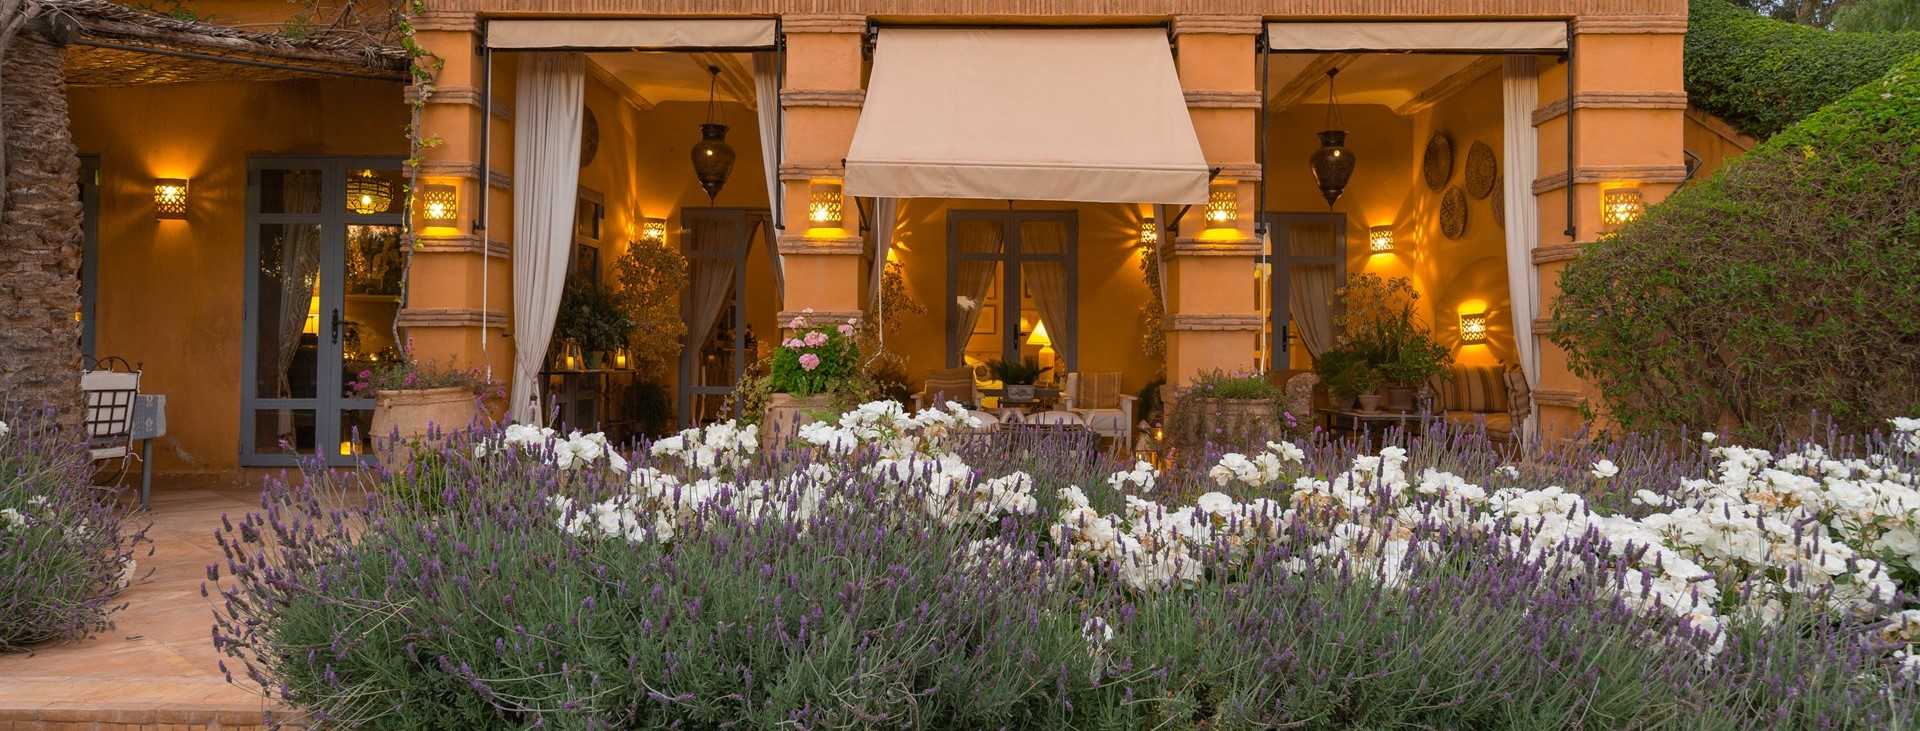 3-bed-luxury-pool-villa-marrakech